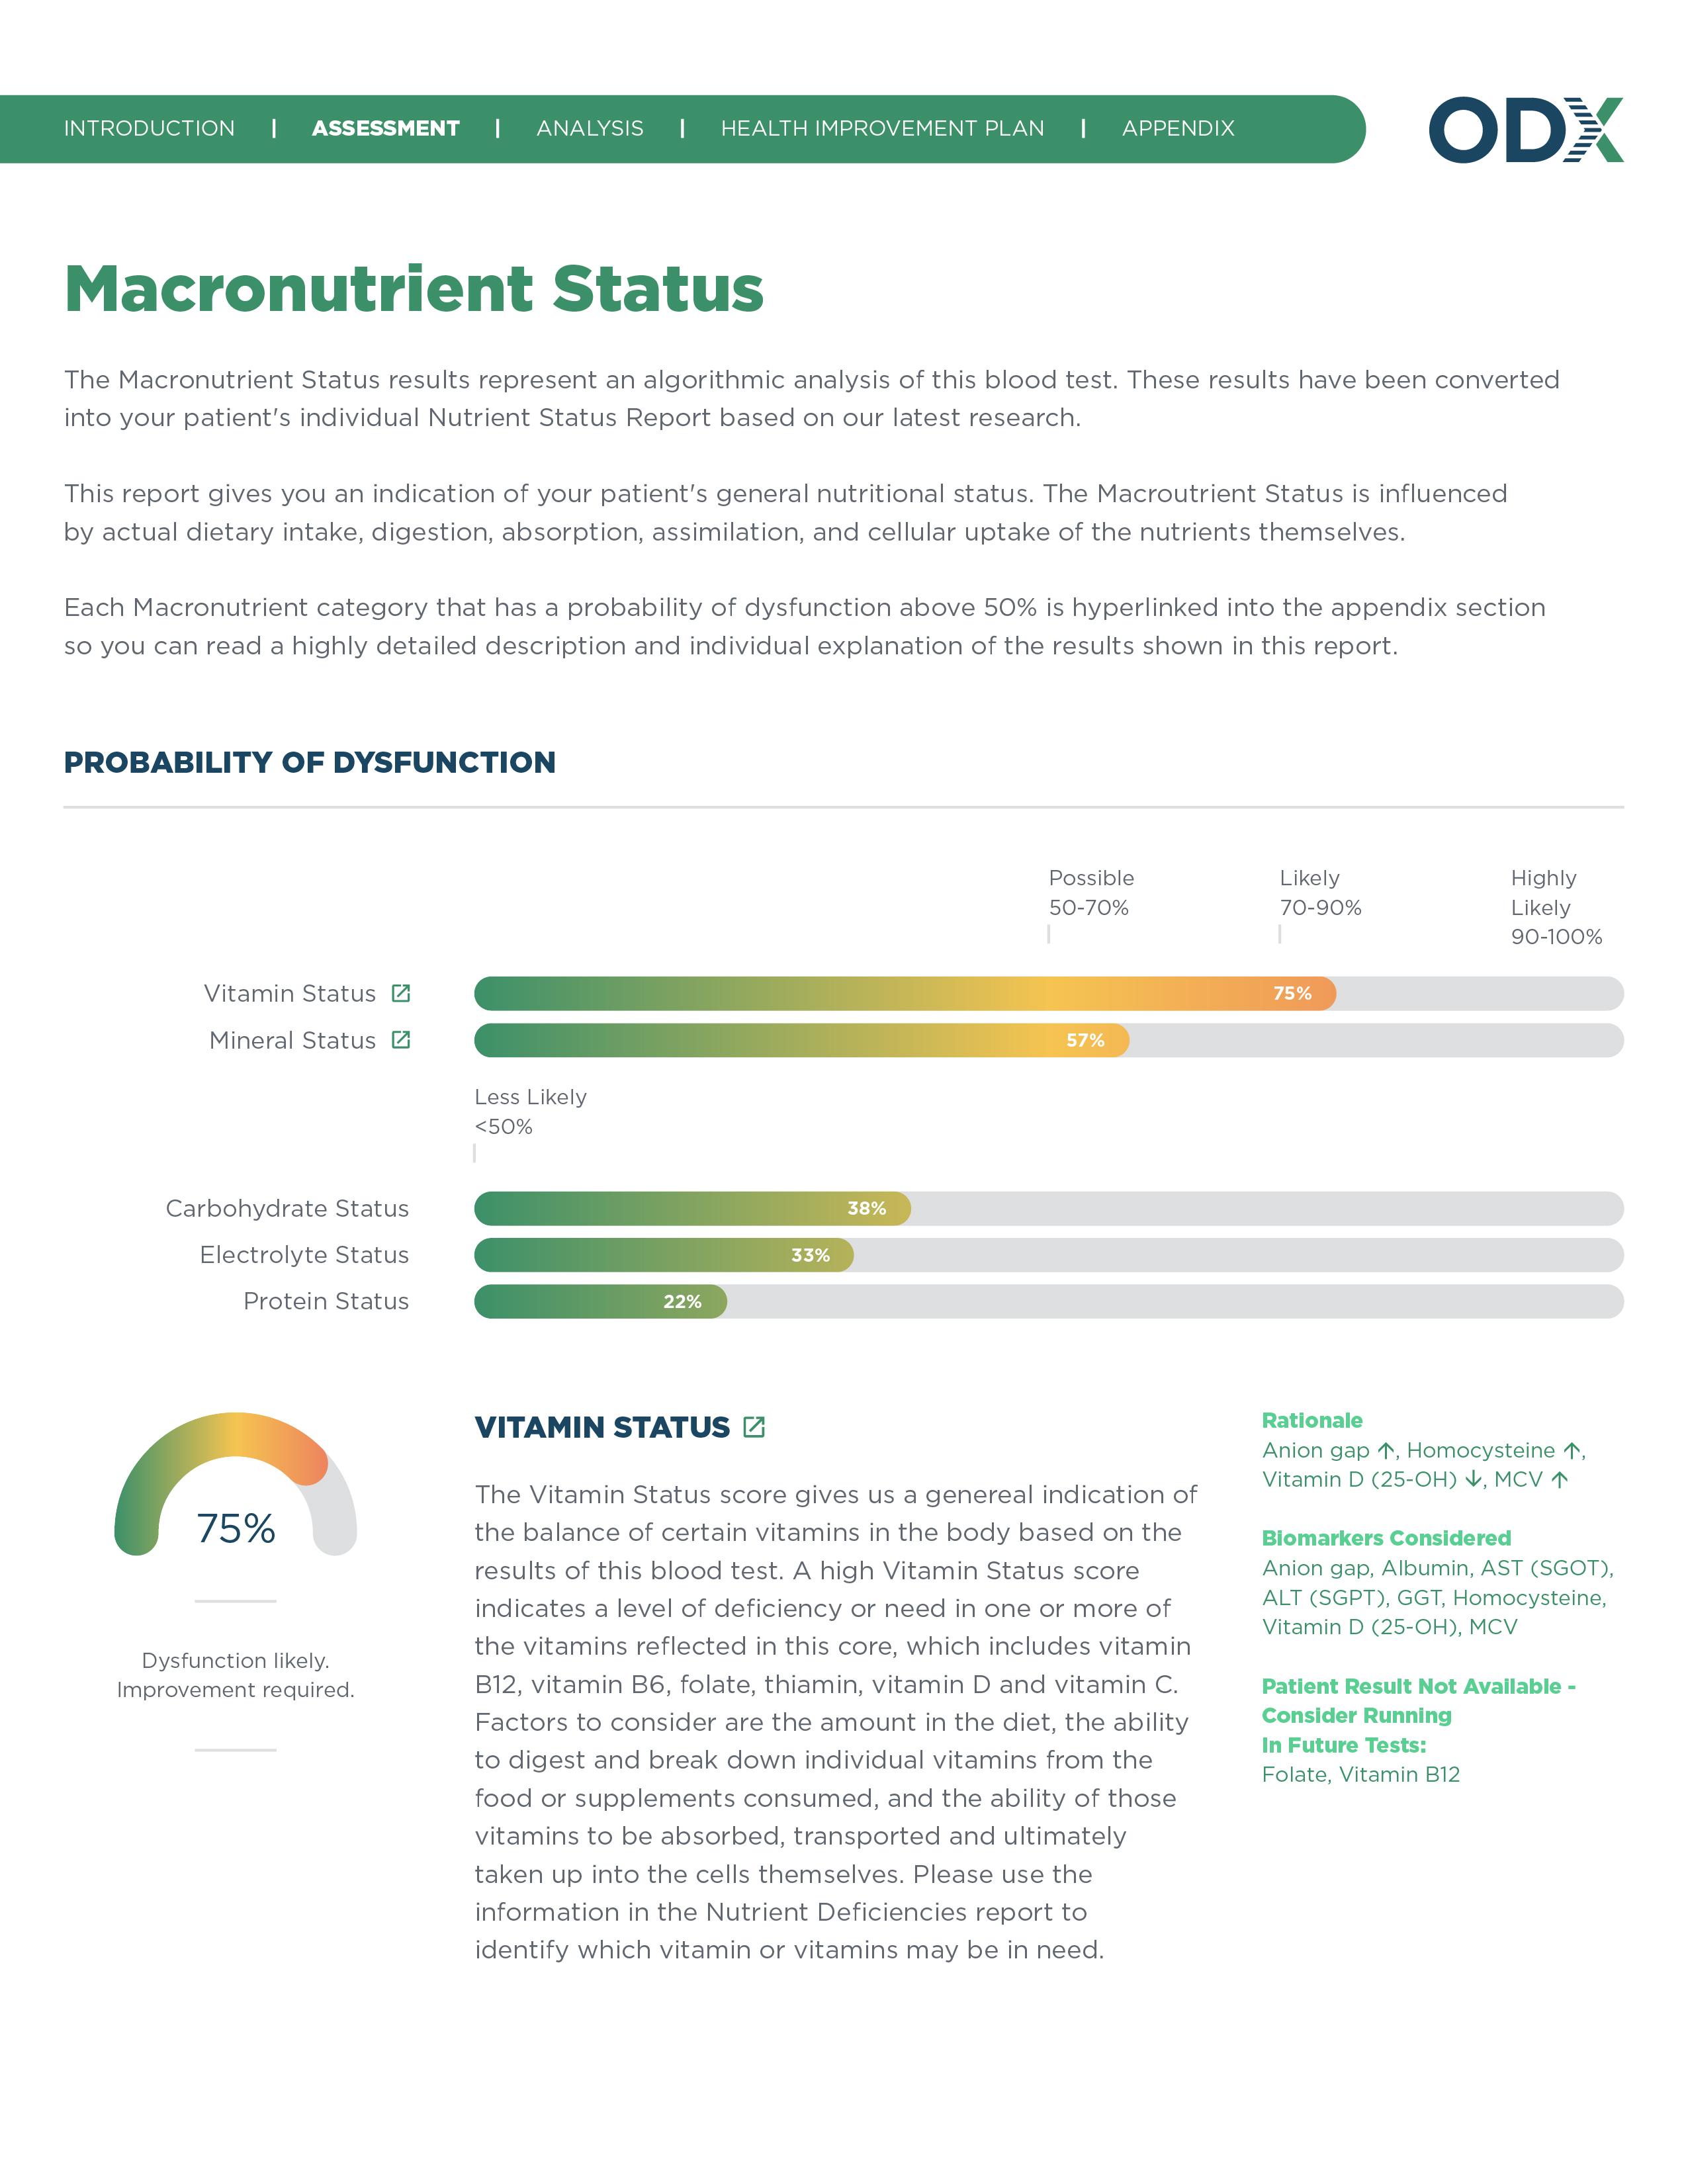 All Report Design for New Site_Macronutrient Status